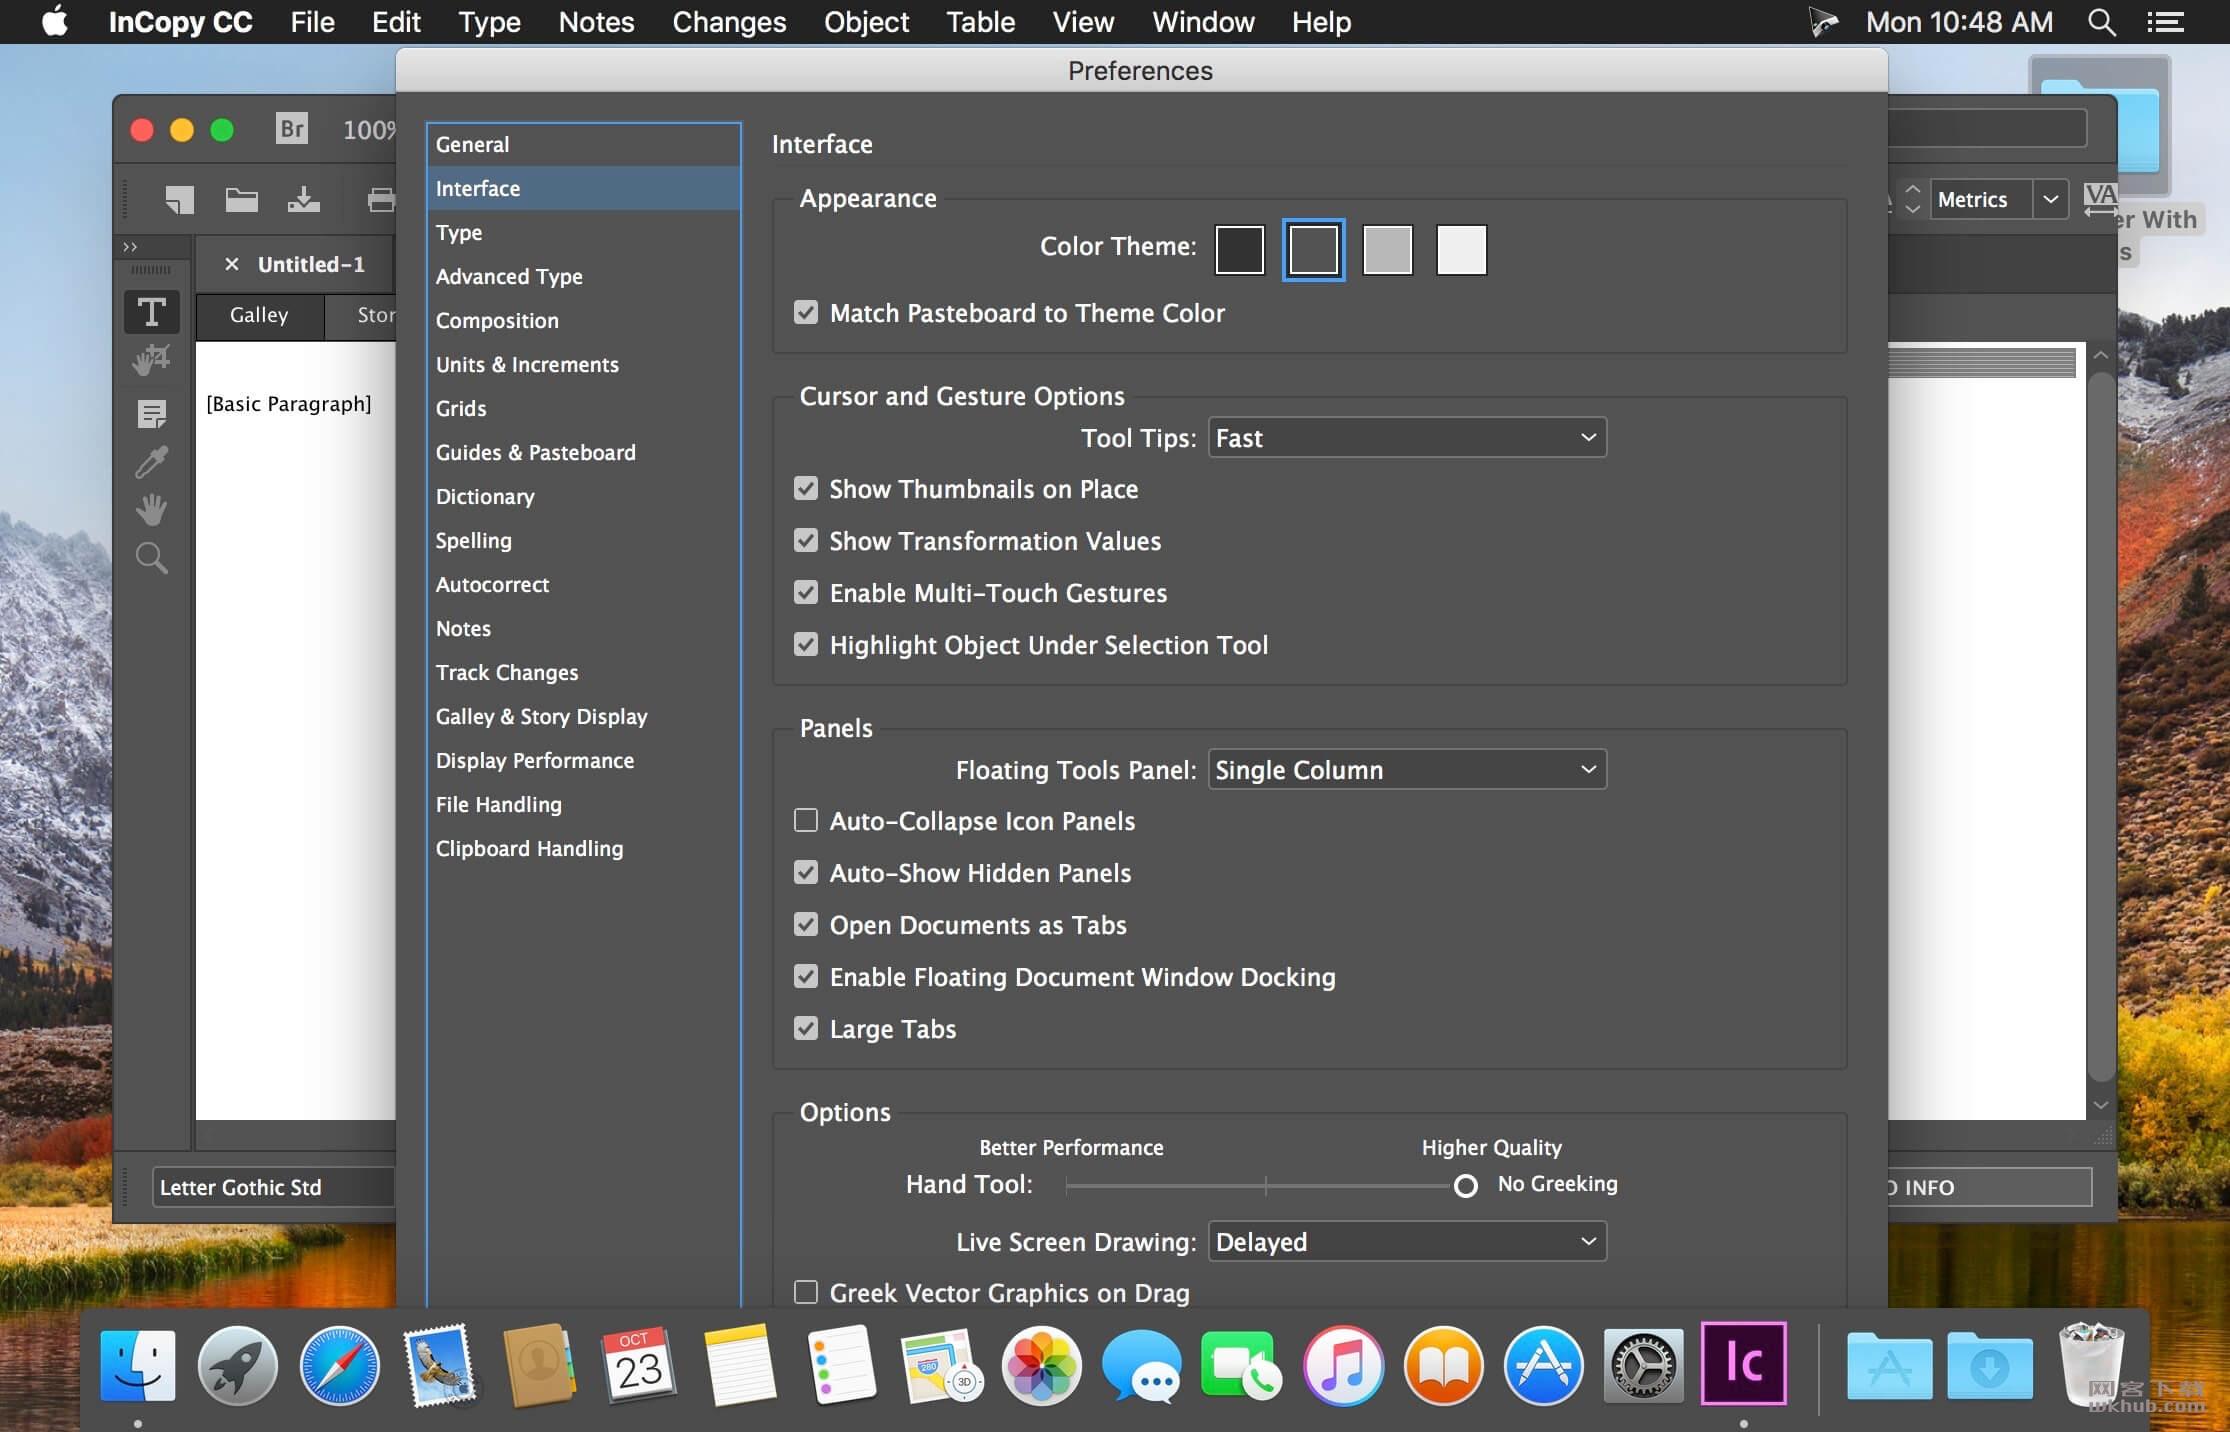 Adobe InCopy 2020 15.0.1 专业的文案编辑排版软件